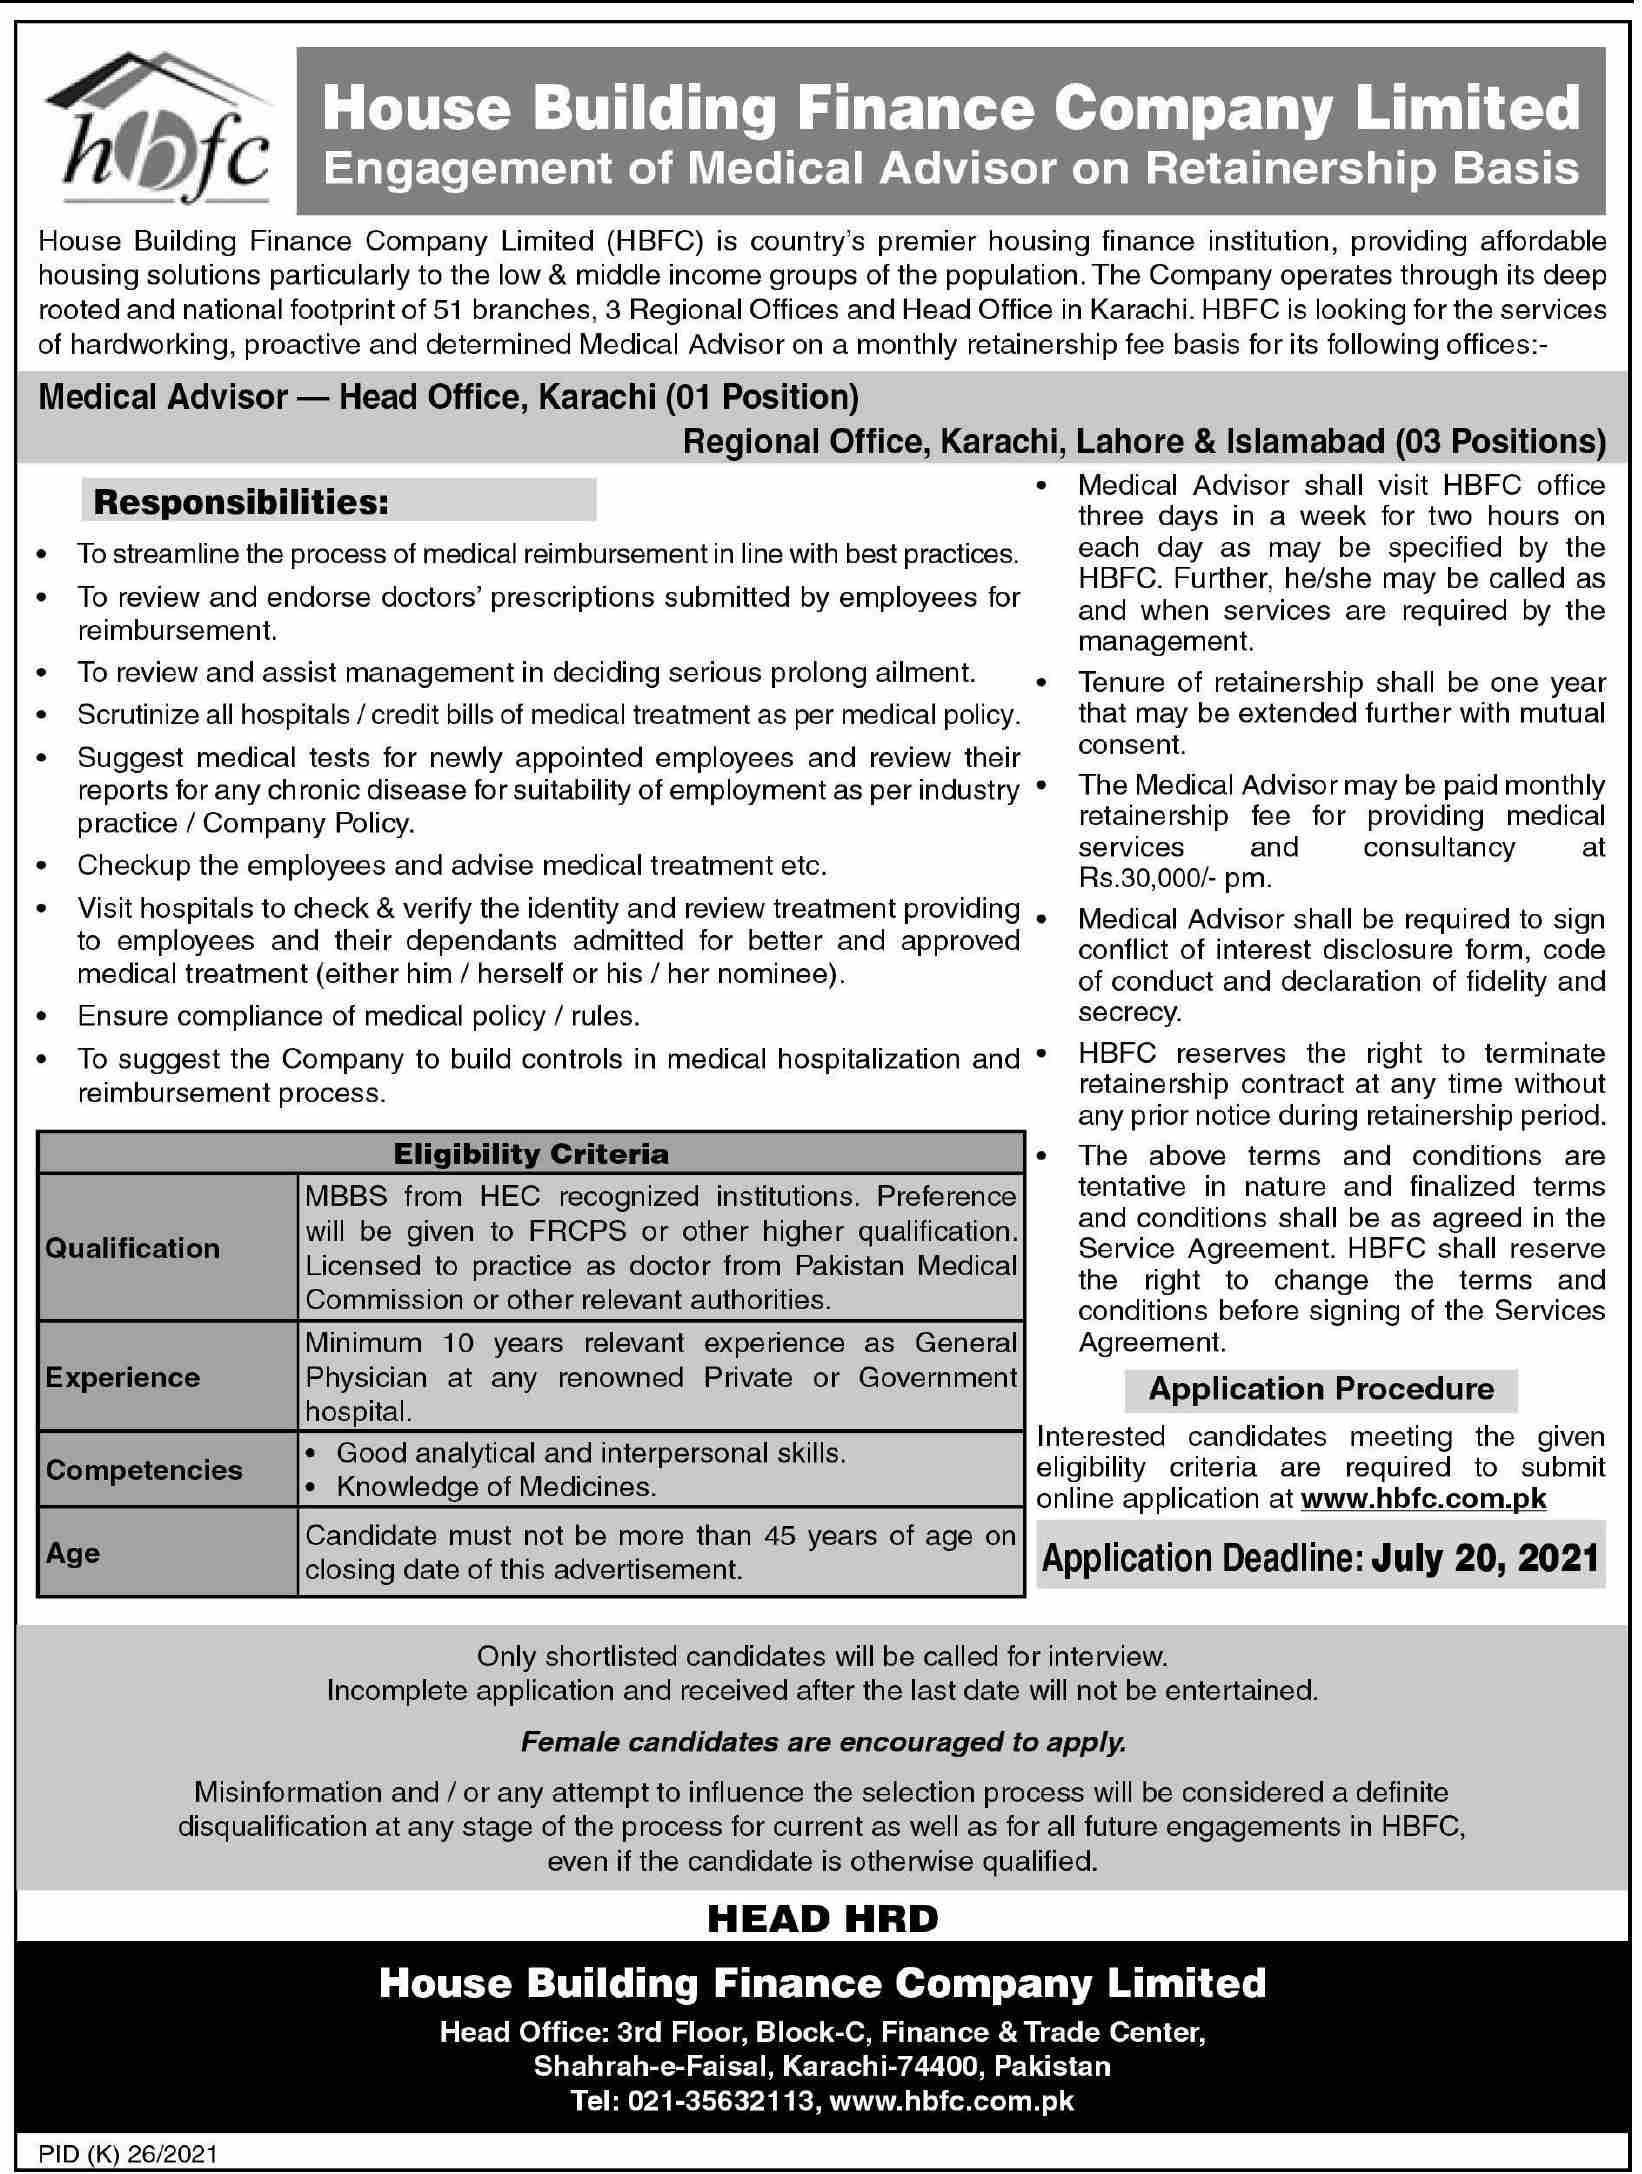 House Building Finance Company Jobs June 2021 for medical Advisor